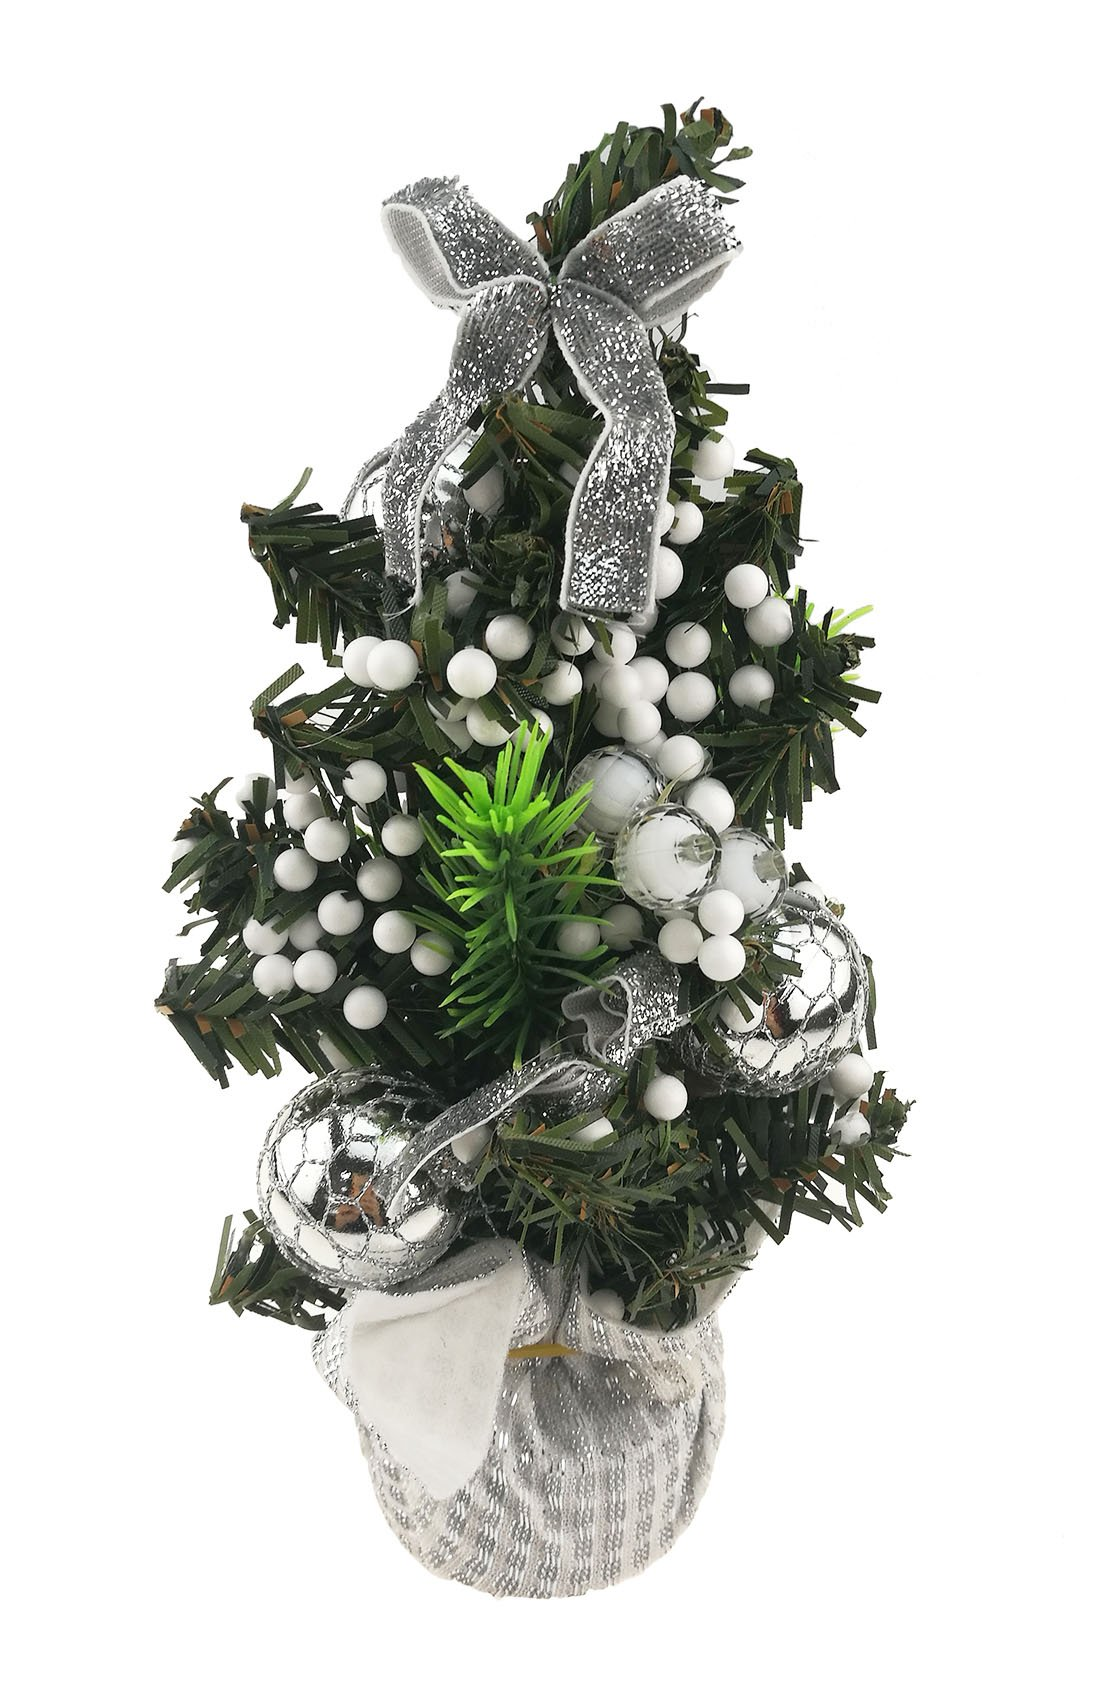 Mini Christmas Tree For Home Desktop Ornament Christmas Gift Decoration (Silvery)